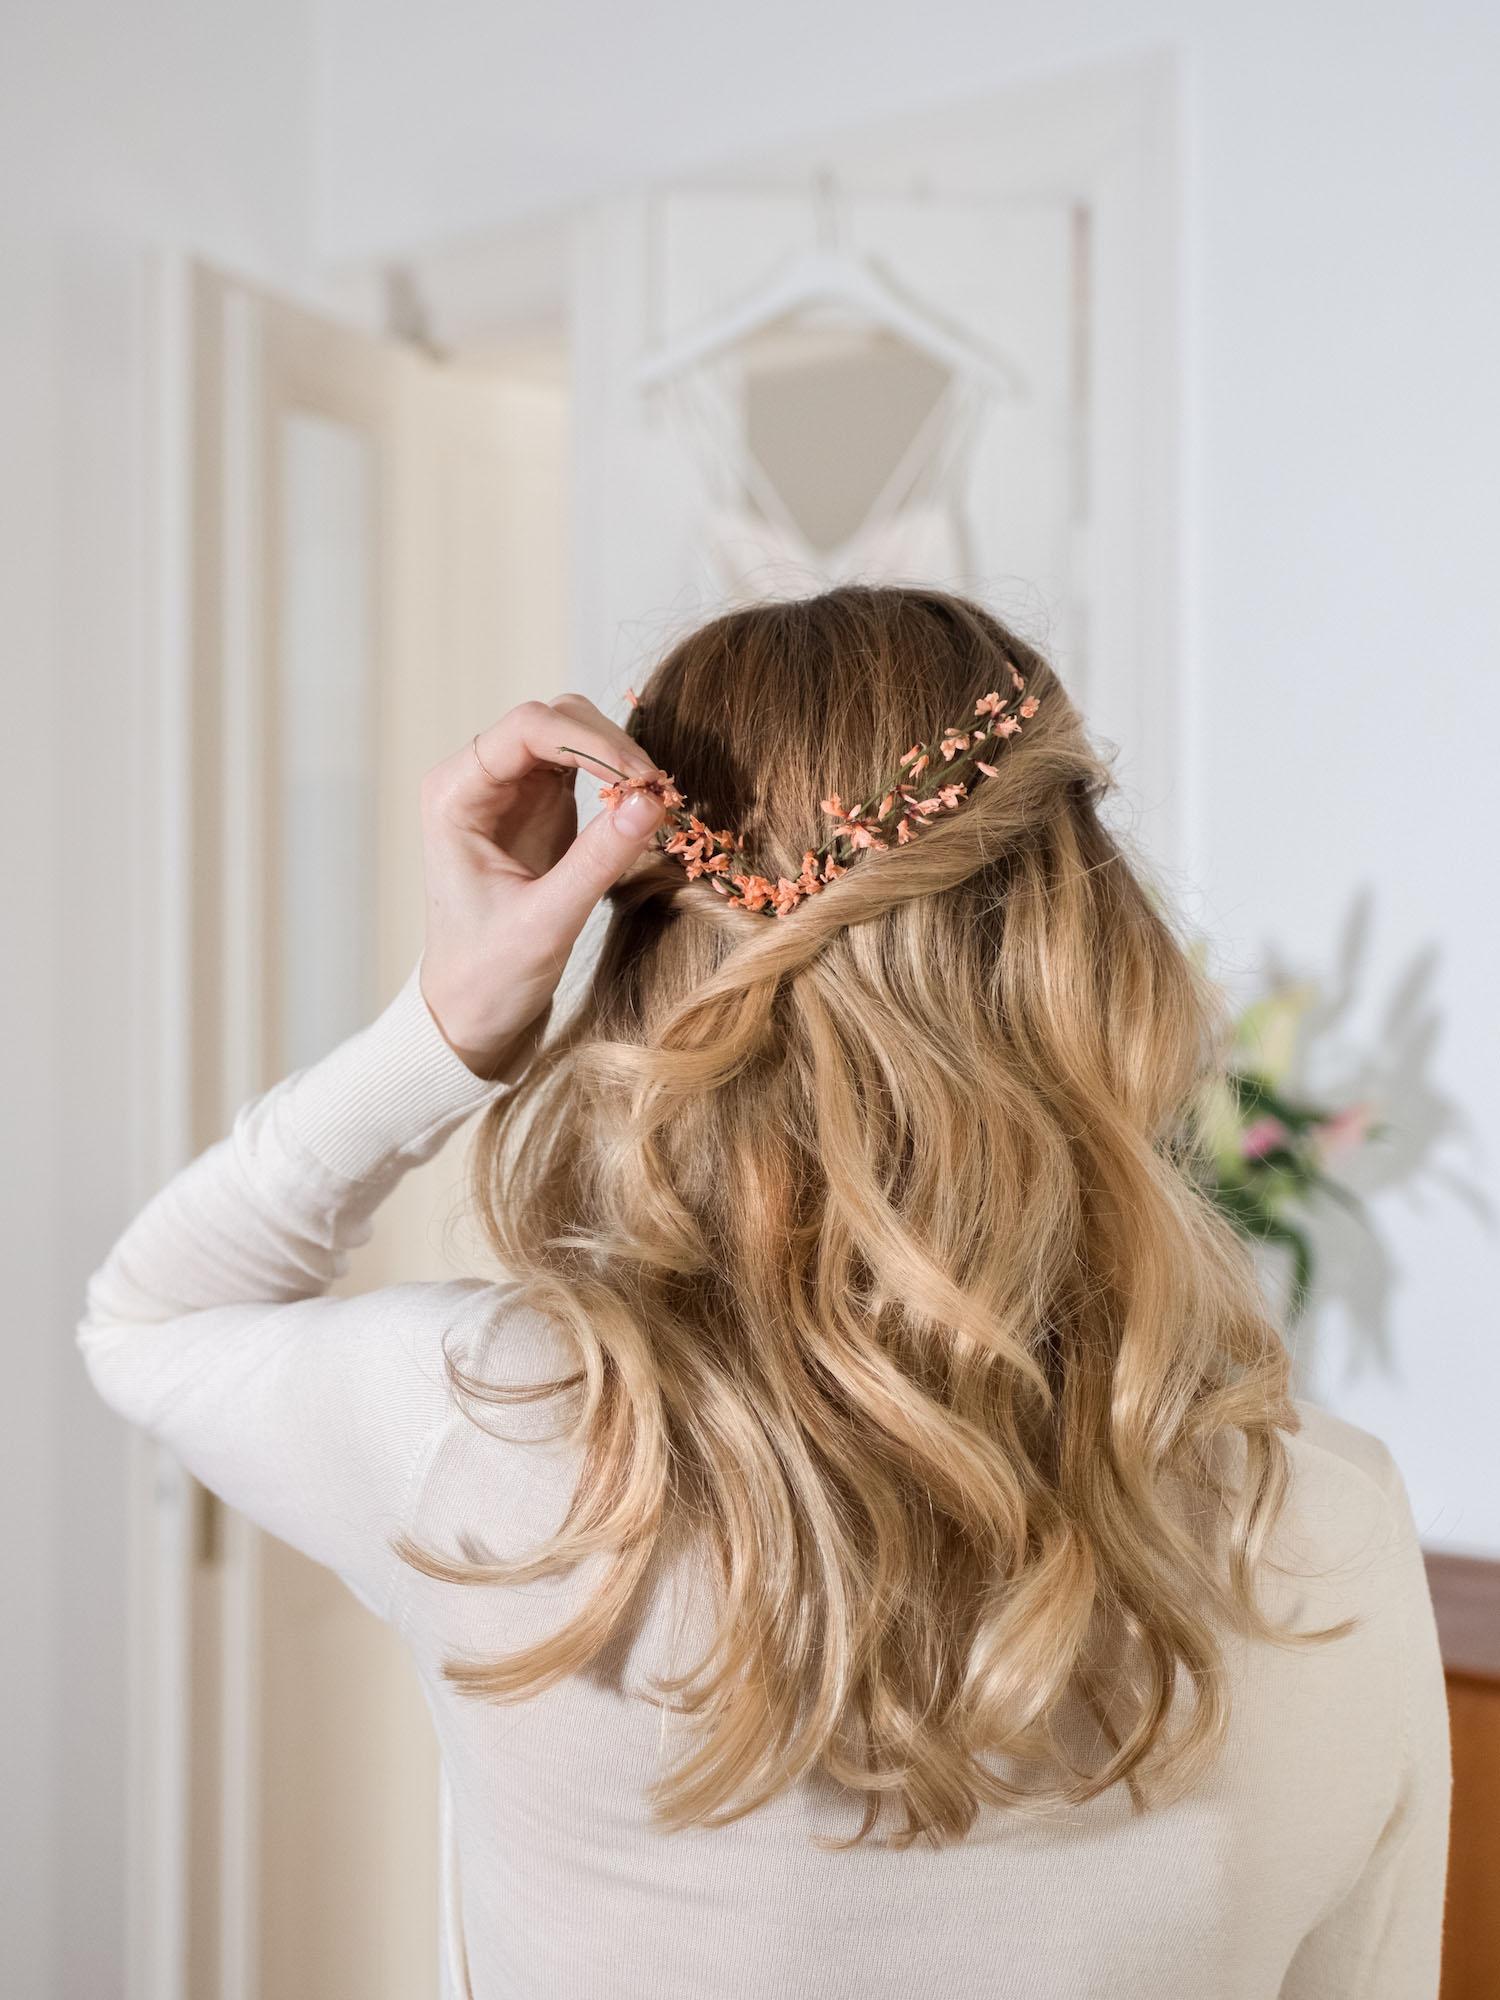 Beautyblog-Wedding-Hair-Step-by-Step-Waves